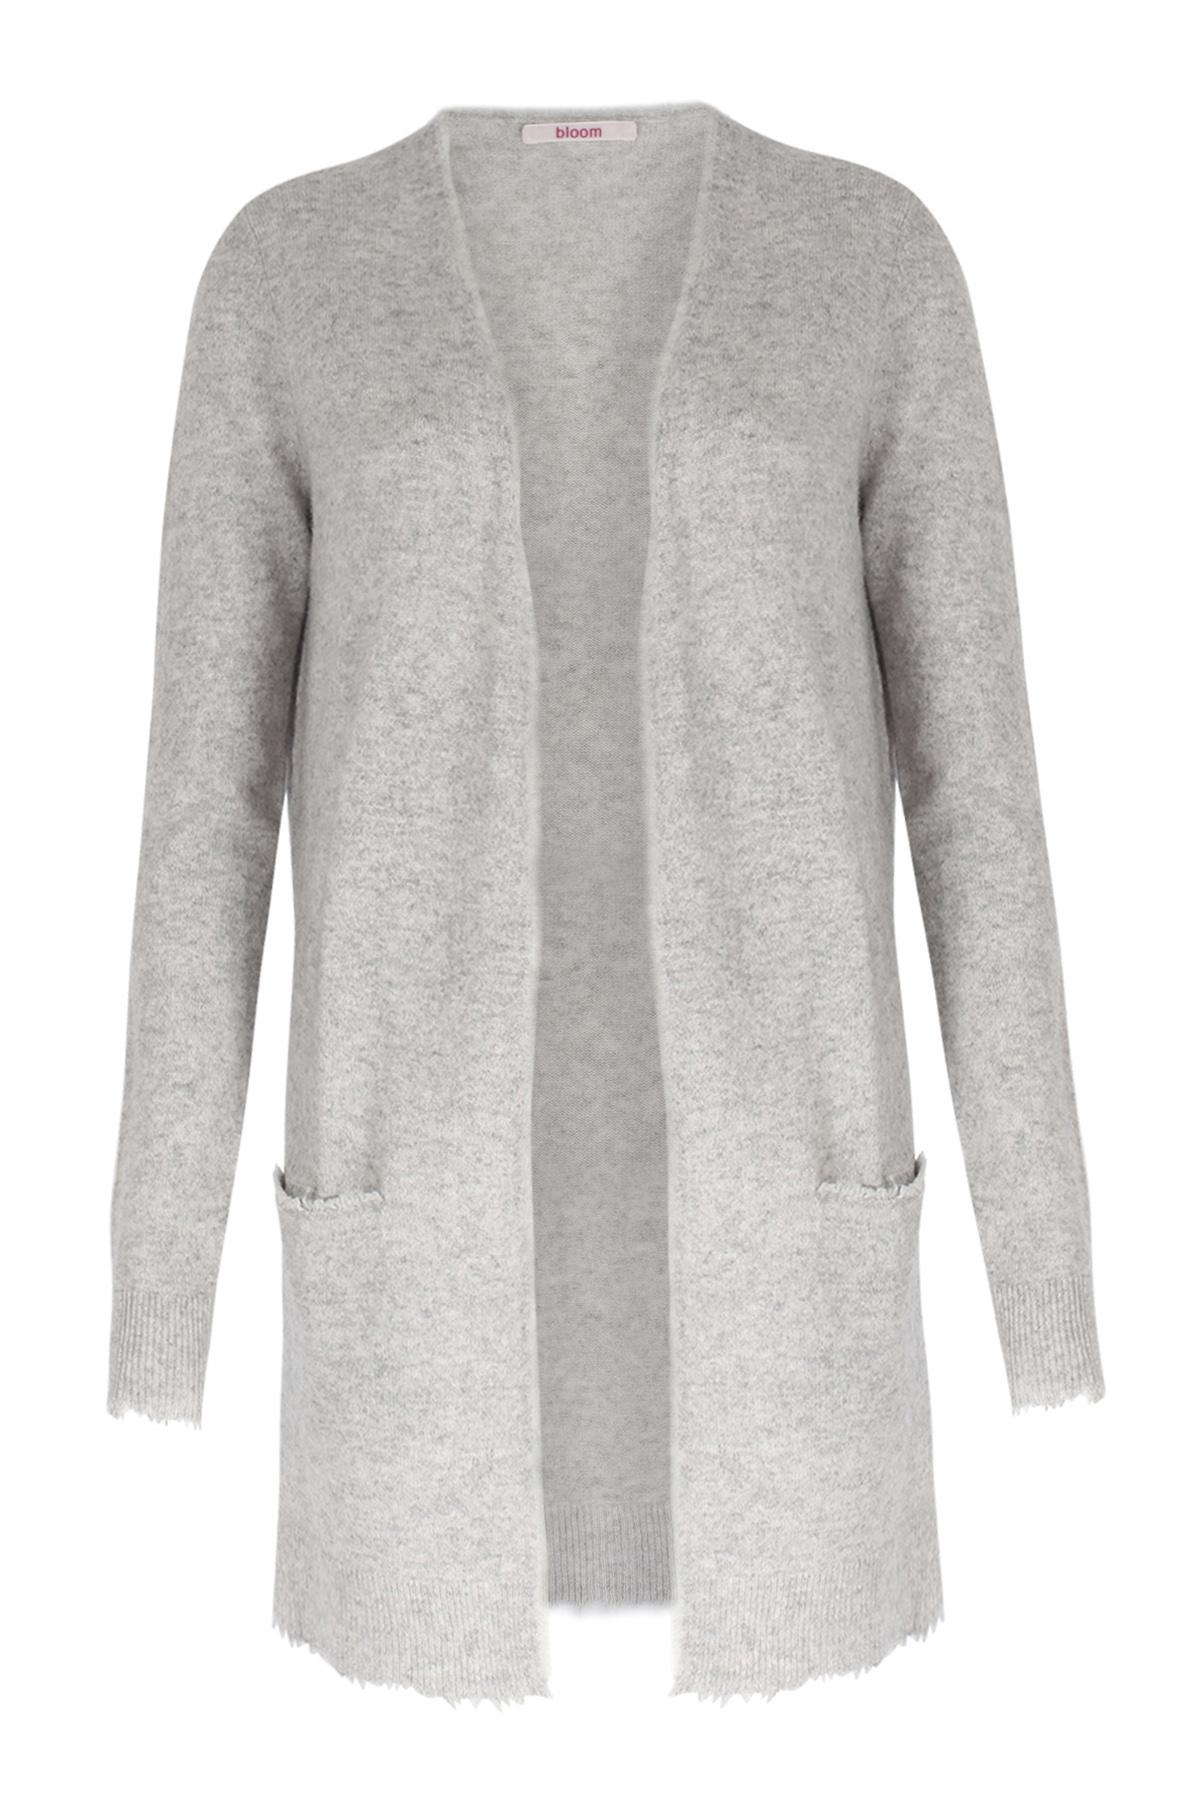 cashmere long cardigan light grey von bloom bei cashmere. Black Bedroom Furniture Sets. Home Design Ideas